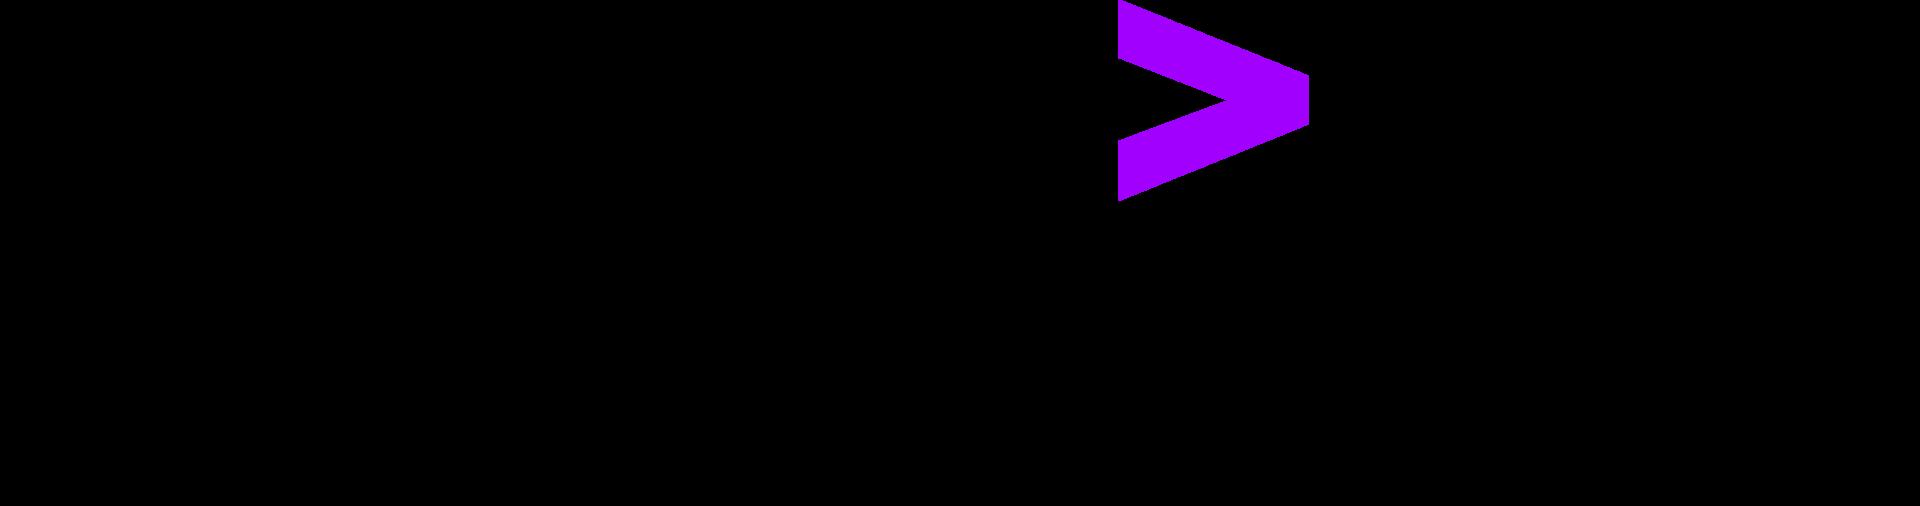 Accenture_Acc_Logo_Black_Purple_RGB